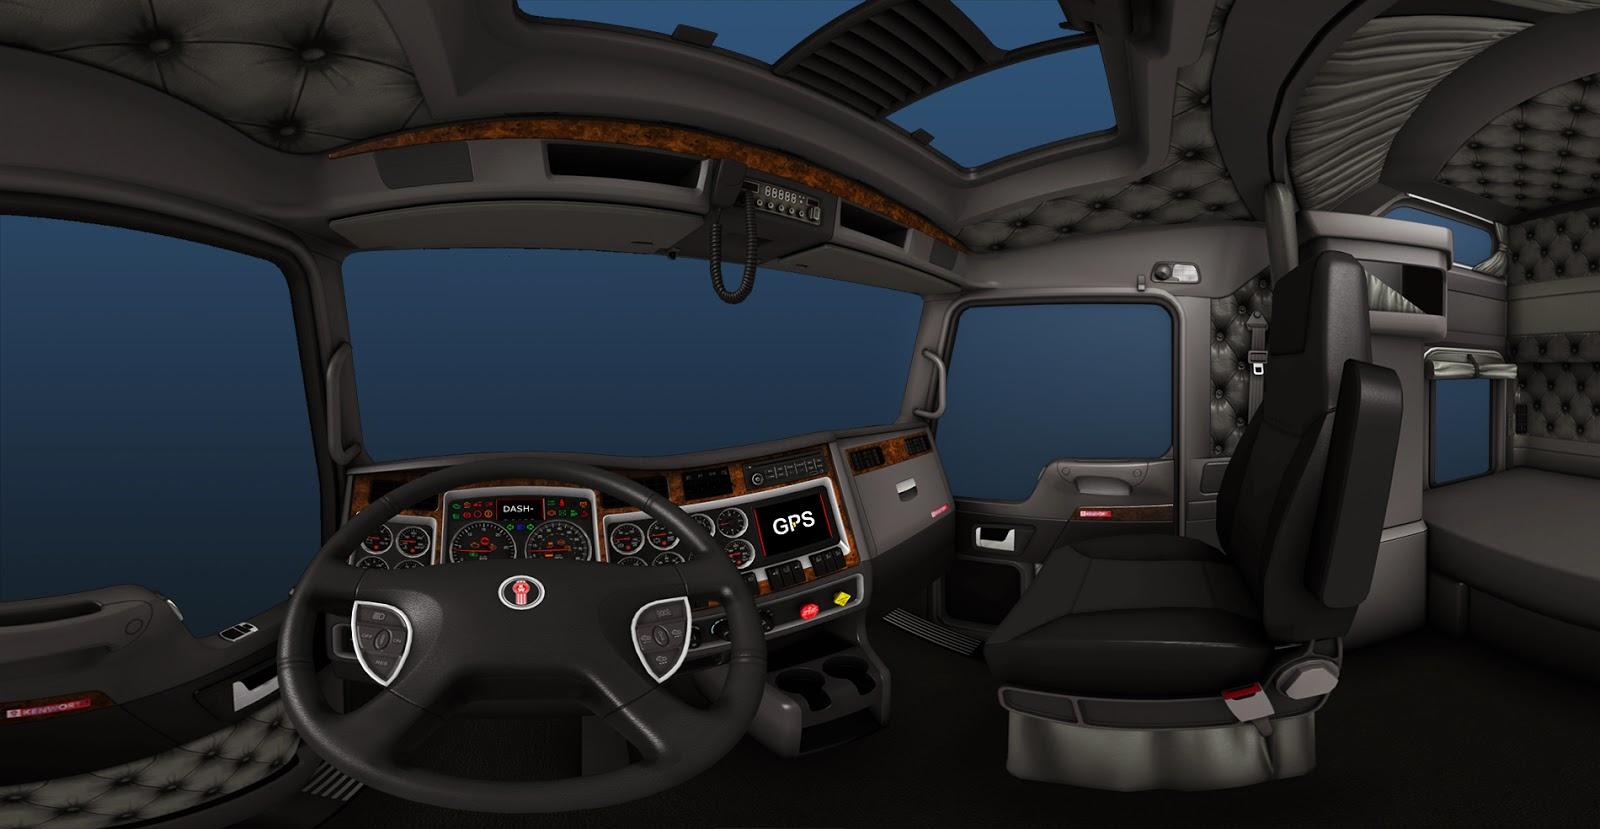 IMAGE(http://1.bp.blogspot.com/-zHyS8ZNJh7Y/UtVw3vA_3HI/AAAAAAAABp4/WBPxk8I4xGk/s1600/k900_int_panorama.jpg)